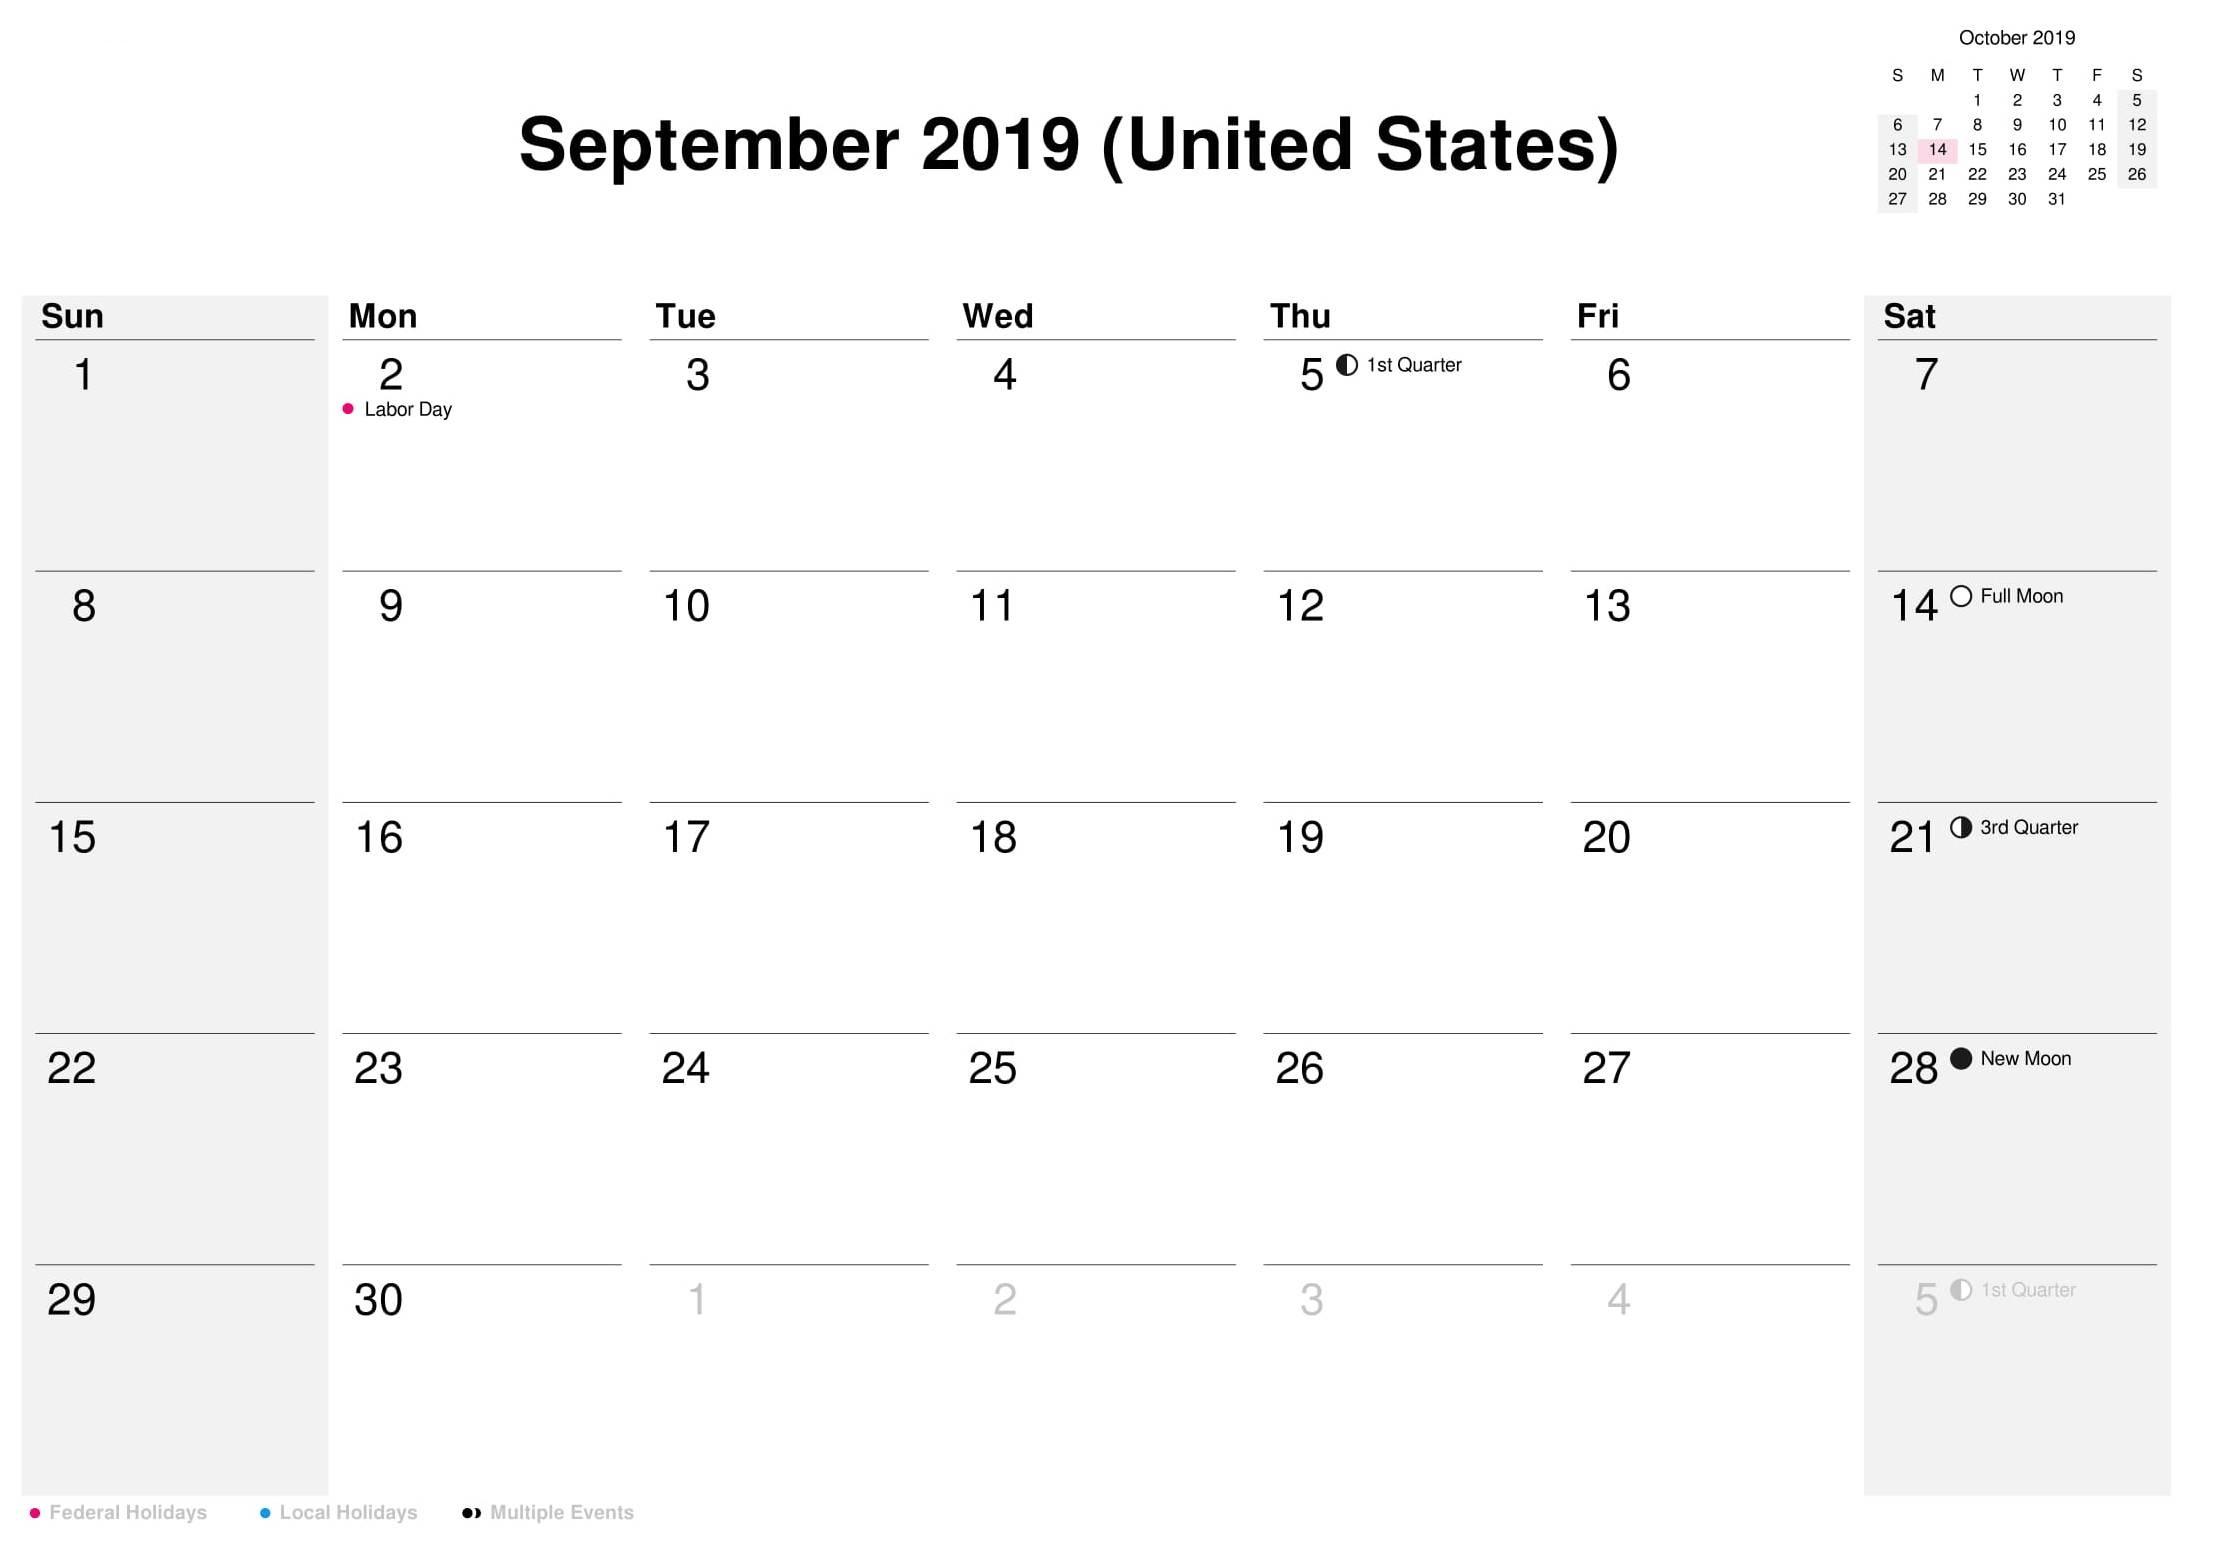 September 2019 US Calendar With Holidays